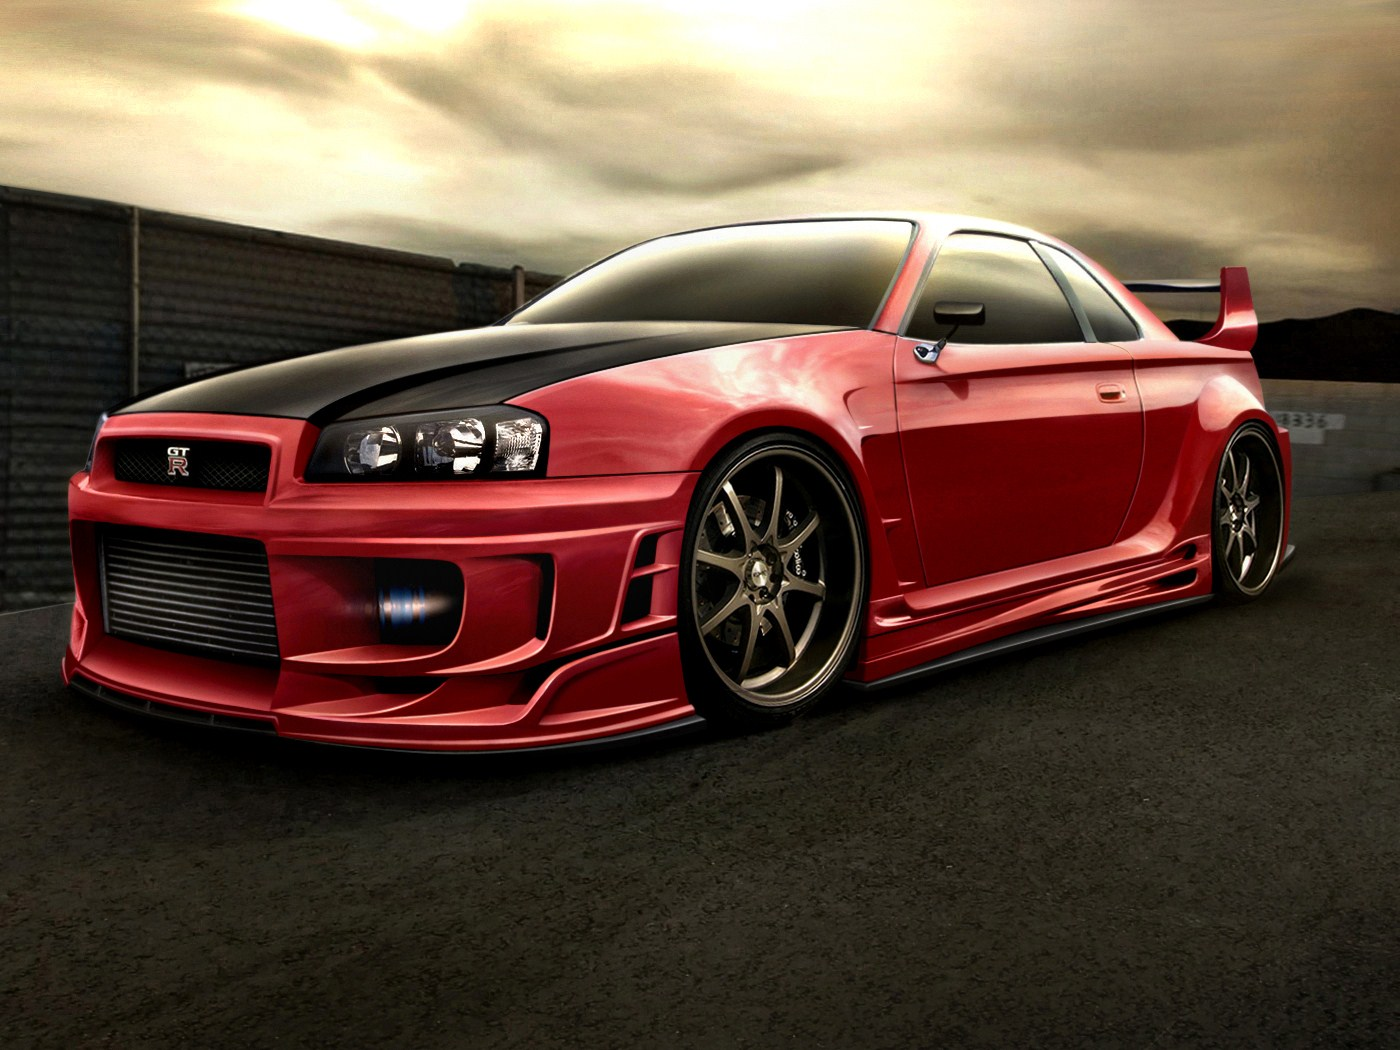 2014 Nissan skyline gtr Car Review - Car Wallpaper ...